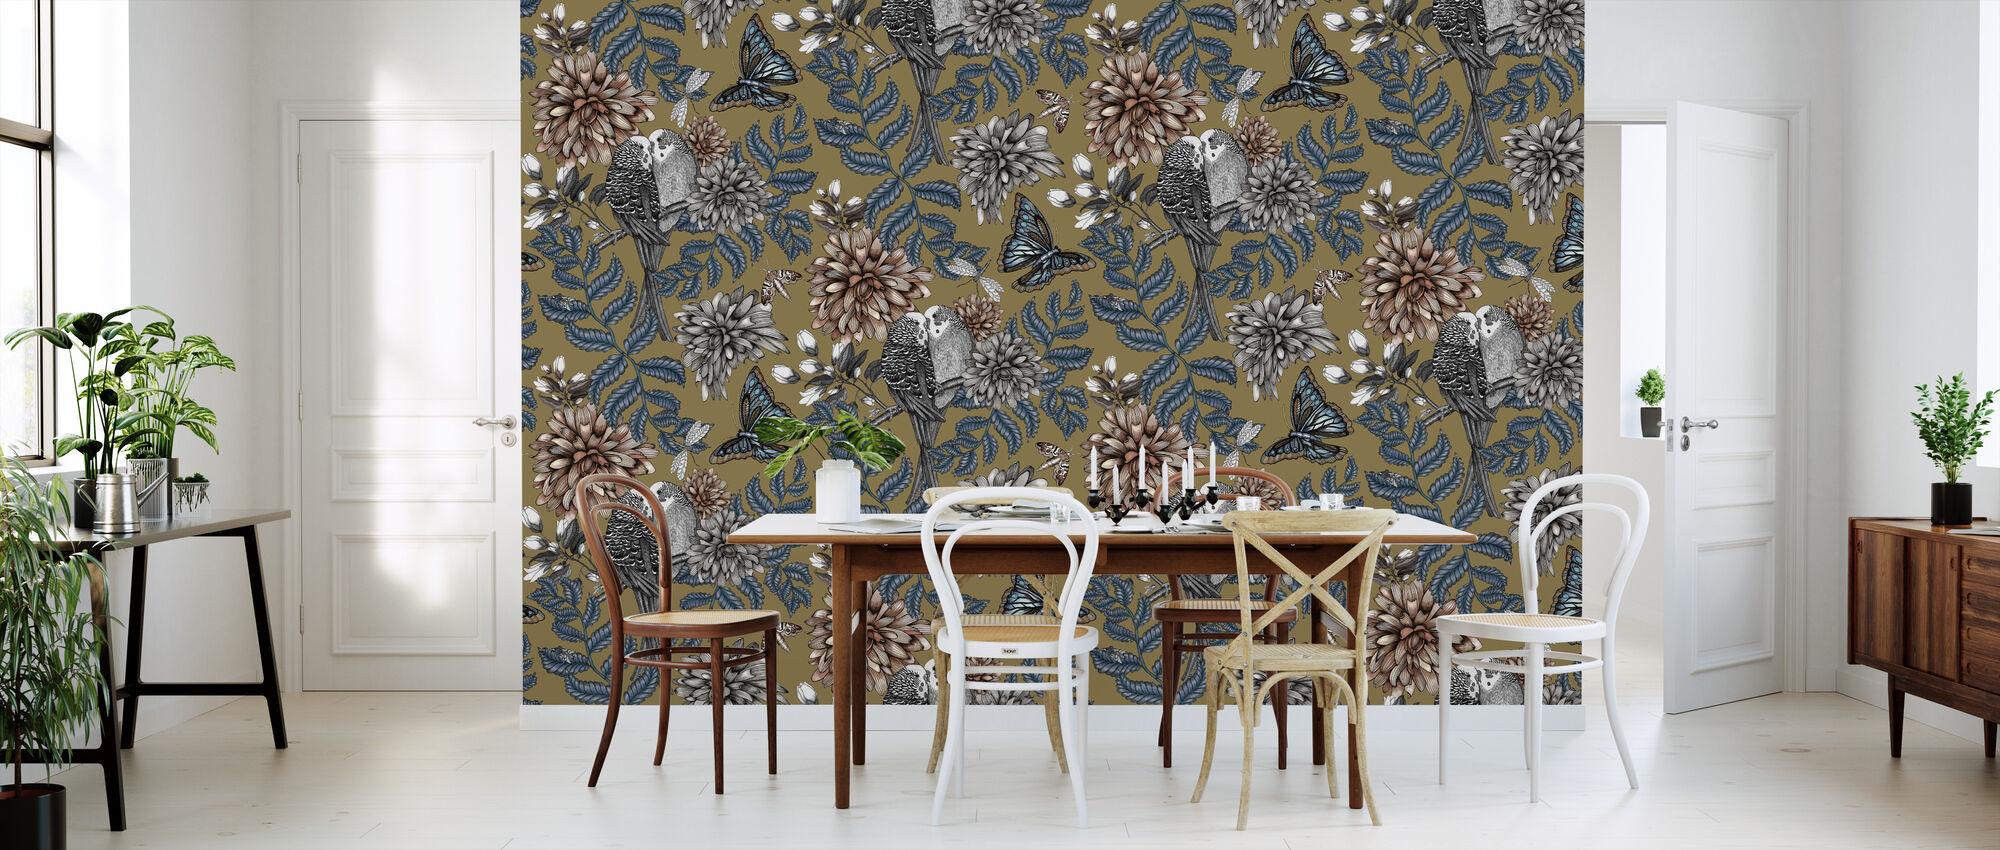 Lovebirds Gold - Large - Wallpaper - Kitchen